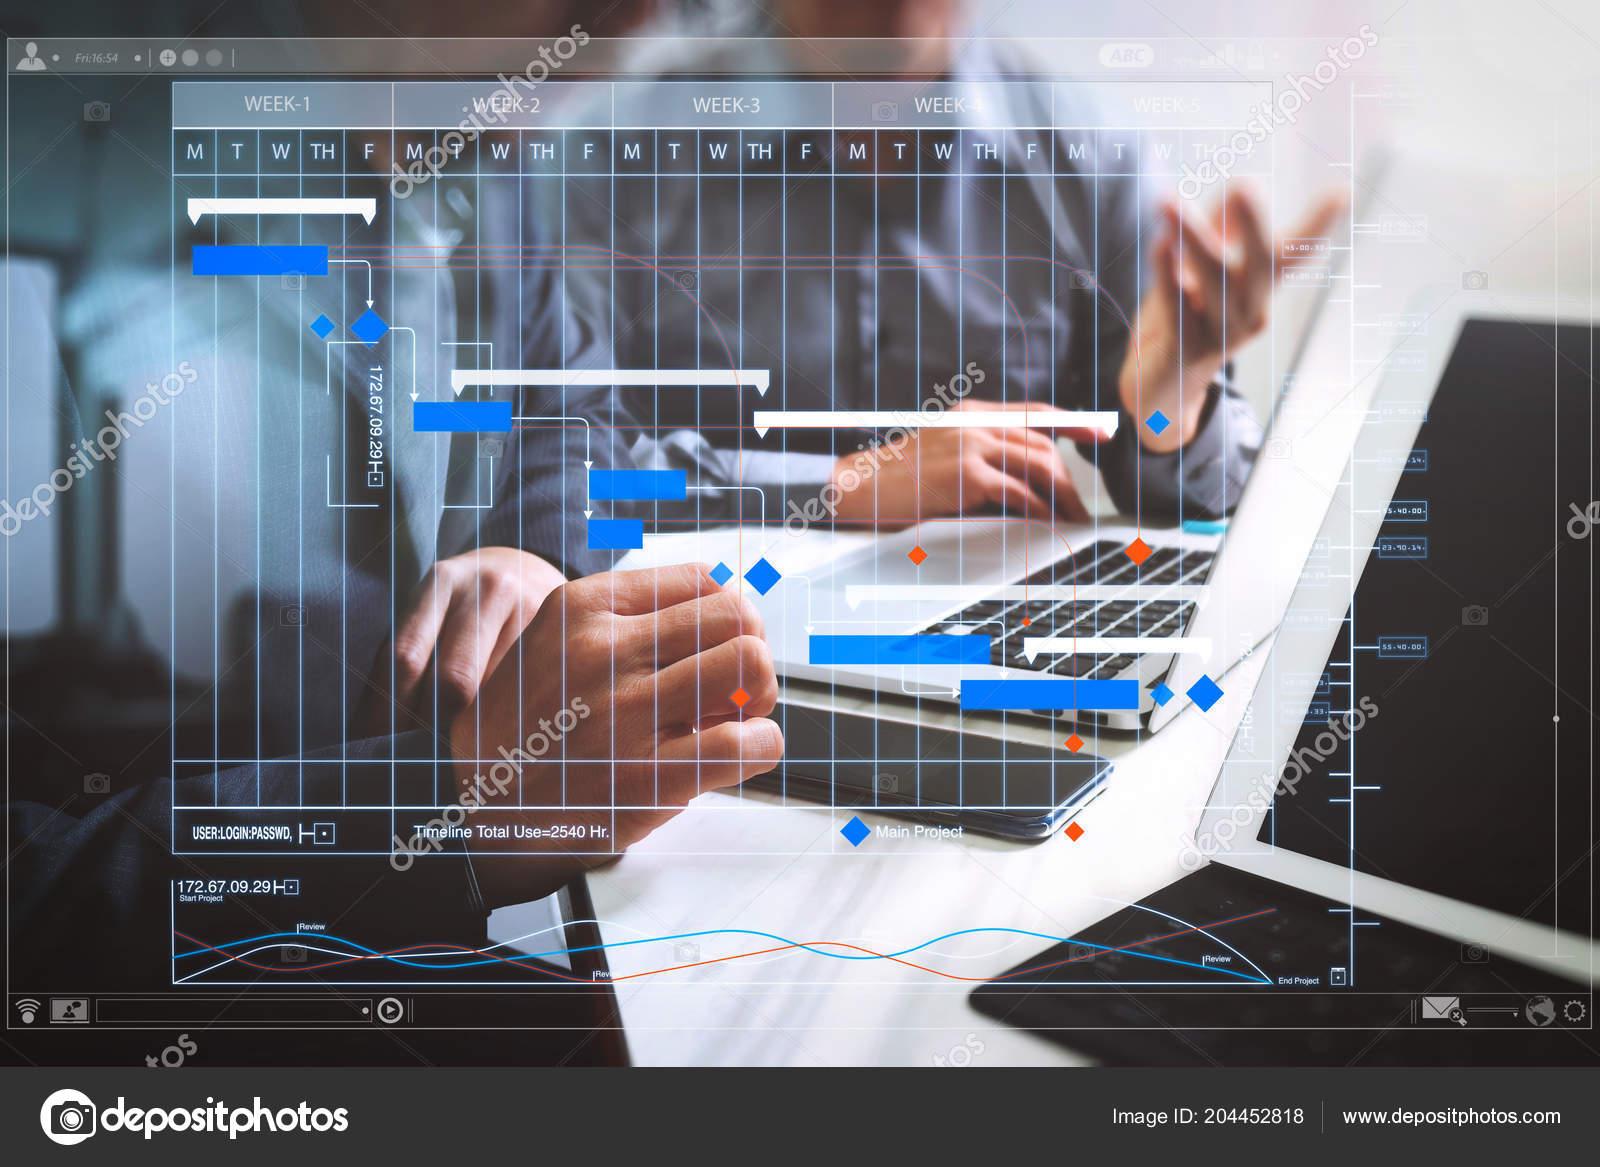 Project Manager Working Update Tasks Milestones Progress Planning